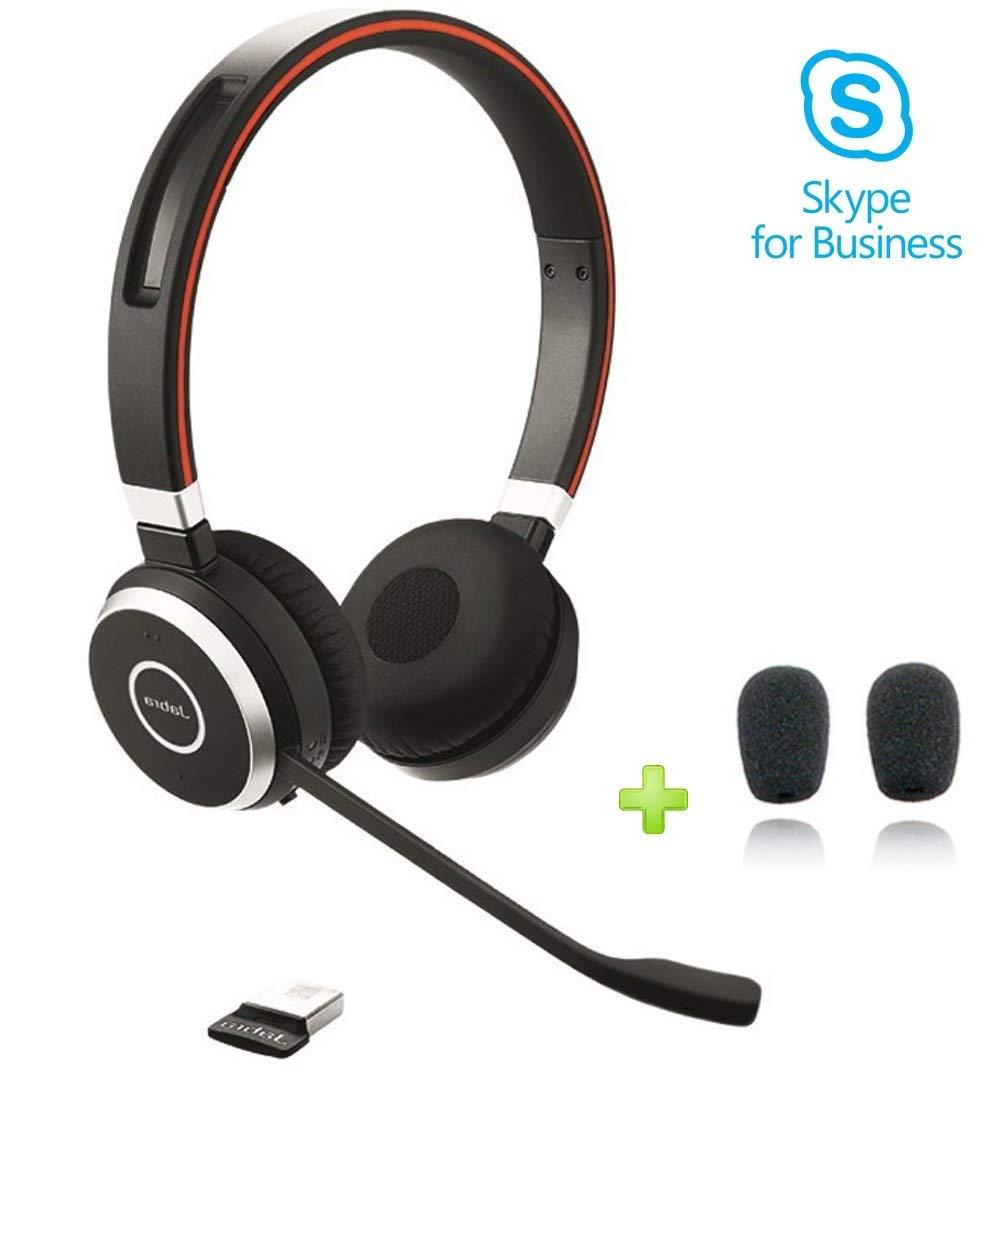 Jabra Evolve 65 Bluetooth Mono MS Headset Bundle | Microsoft Skype Lync Certified, Windows PC, MAC, Smartphone, Streaming Music, IP Softphones, NFC | Bonus Premium Microphone Cushions, 6593-823-309-C Global Teck